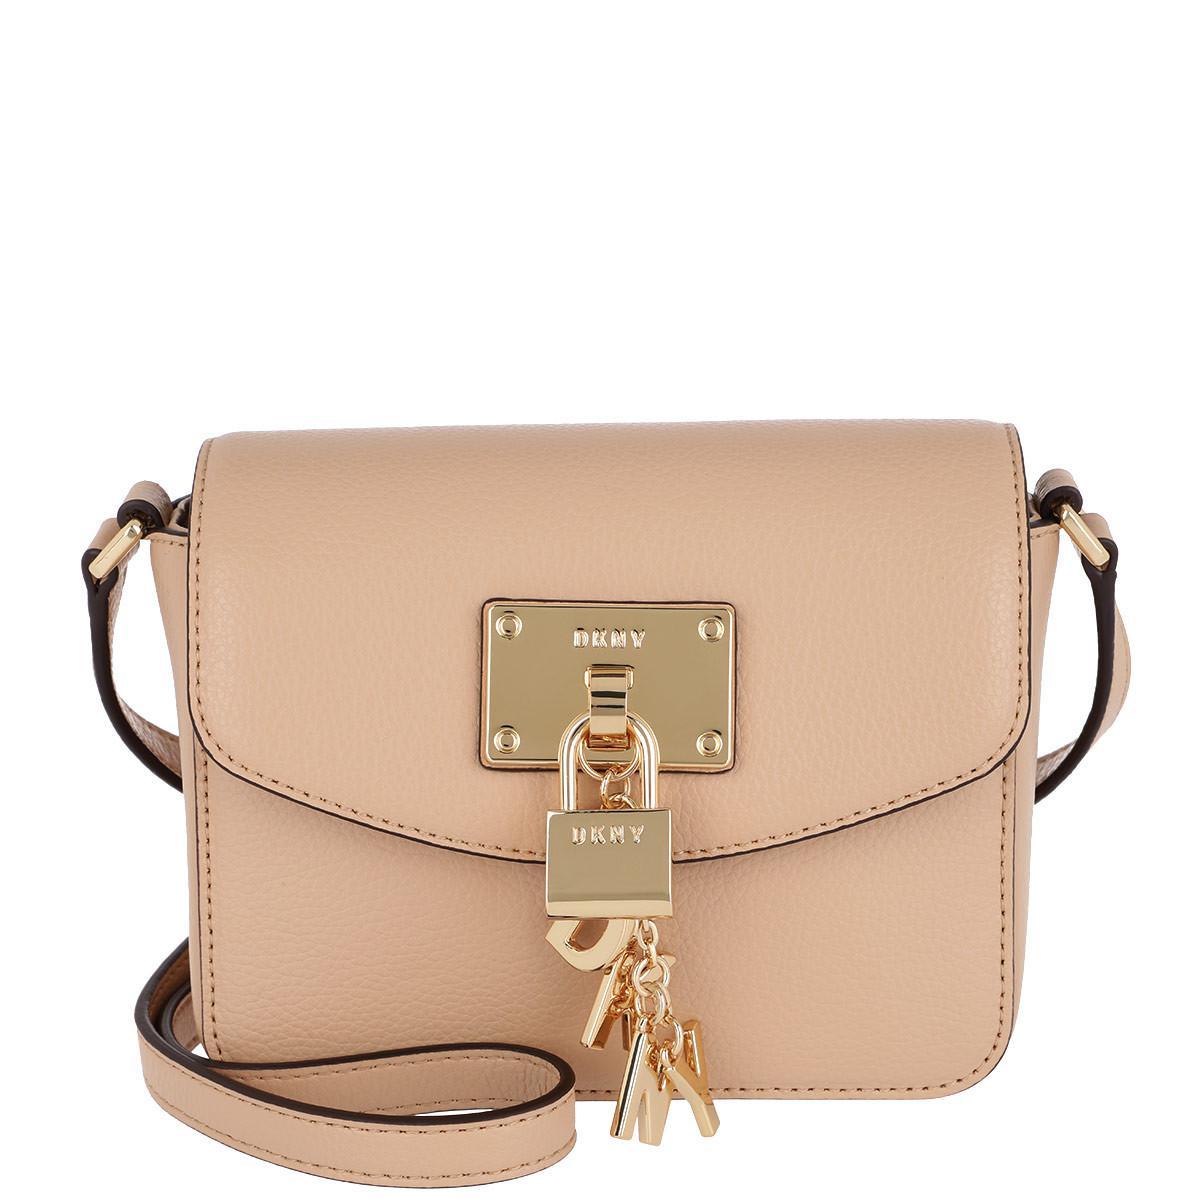 Cross Body Bags - Ann MD Flap Crossbody Bag Black/Gold - black - Cross Body Bags for ladies DKNY B5LkWWBpc